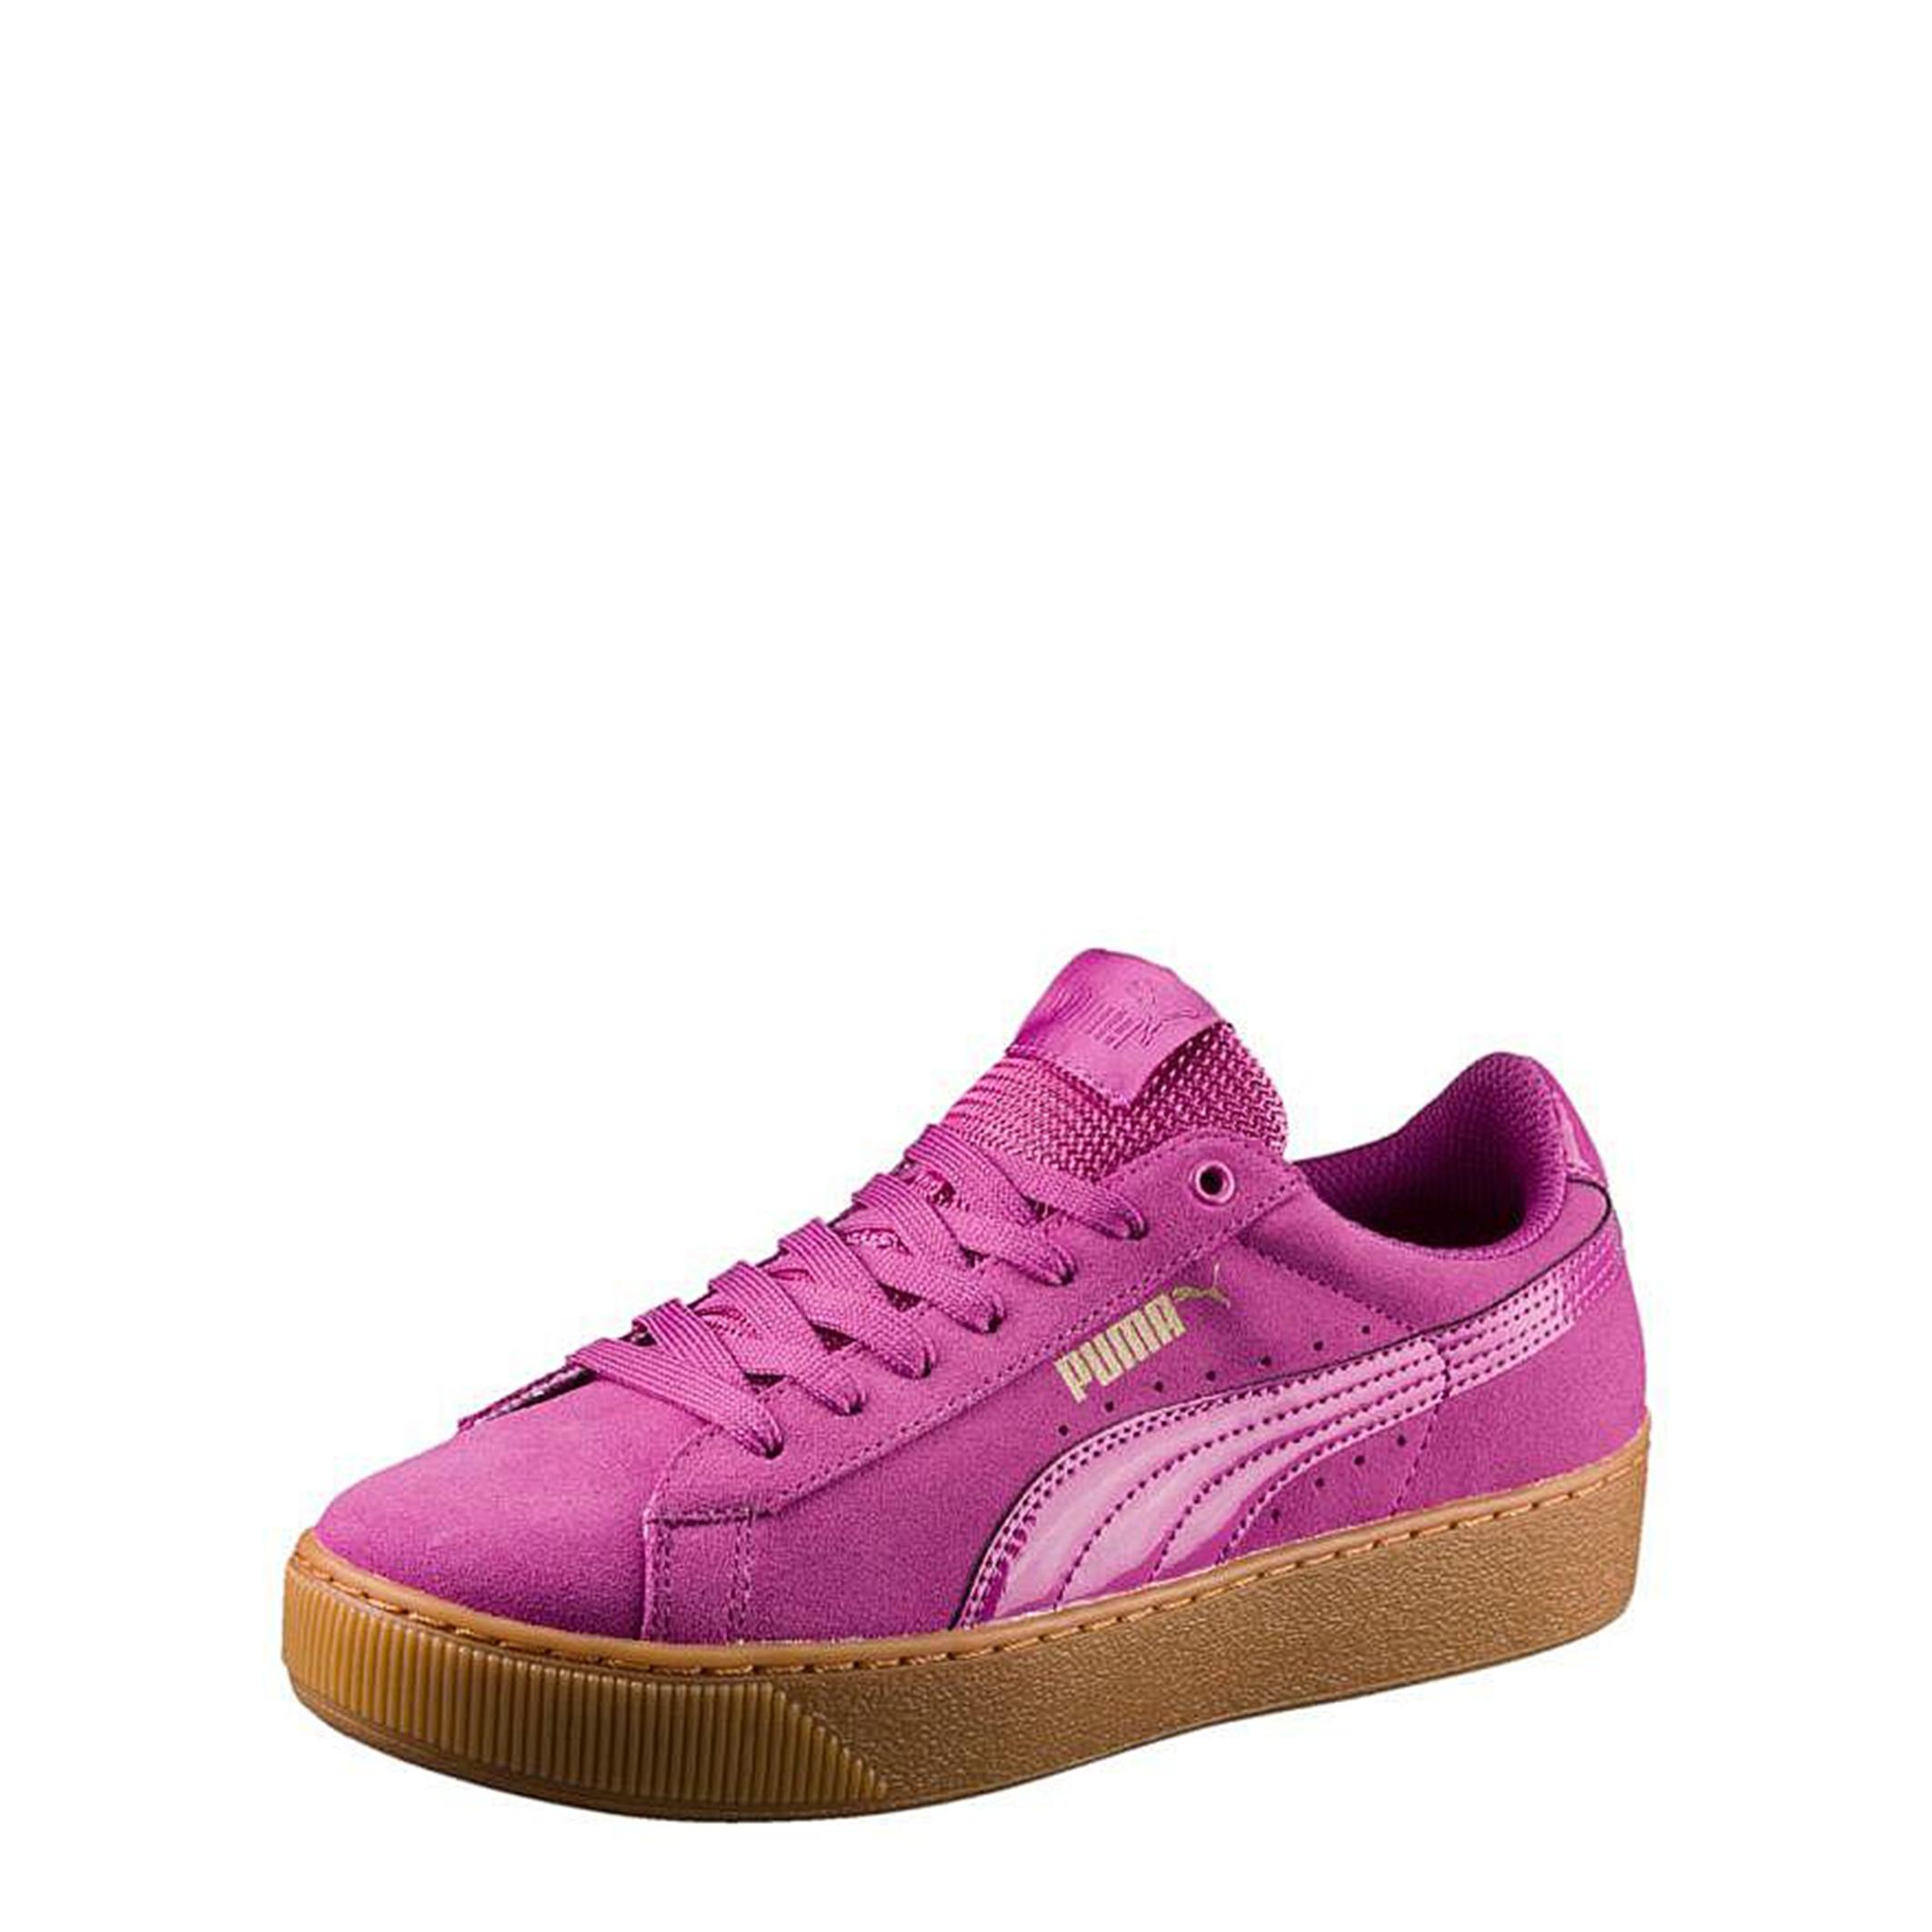 Baskets / Sneakers  Puma 363287 violet